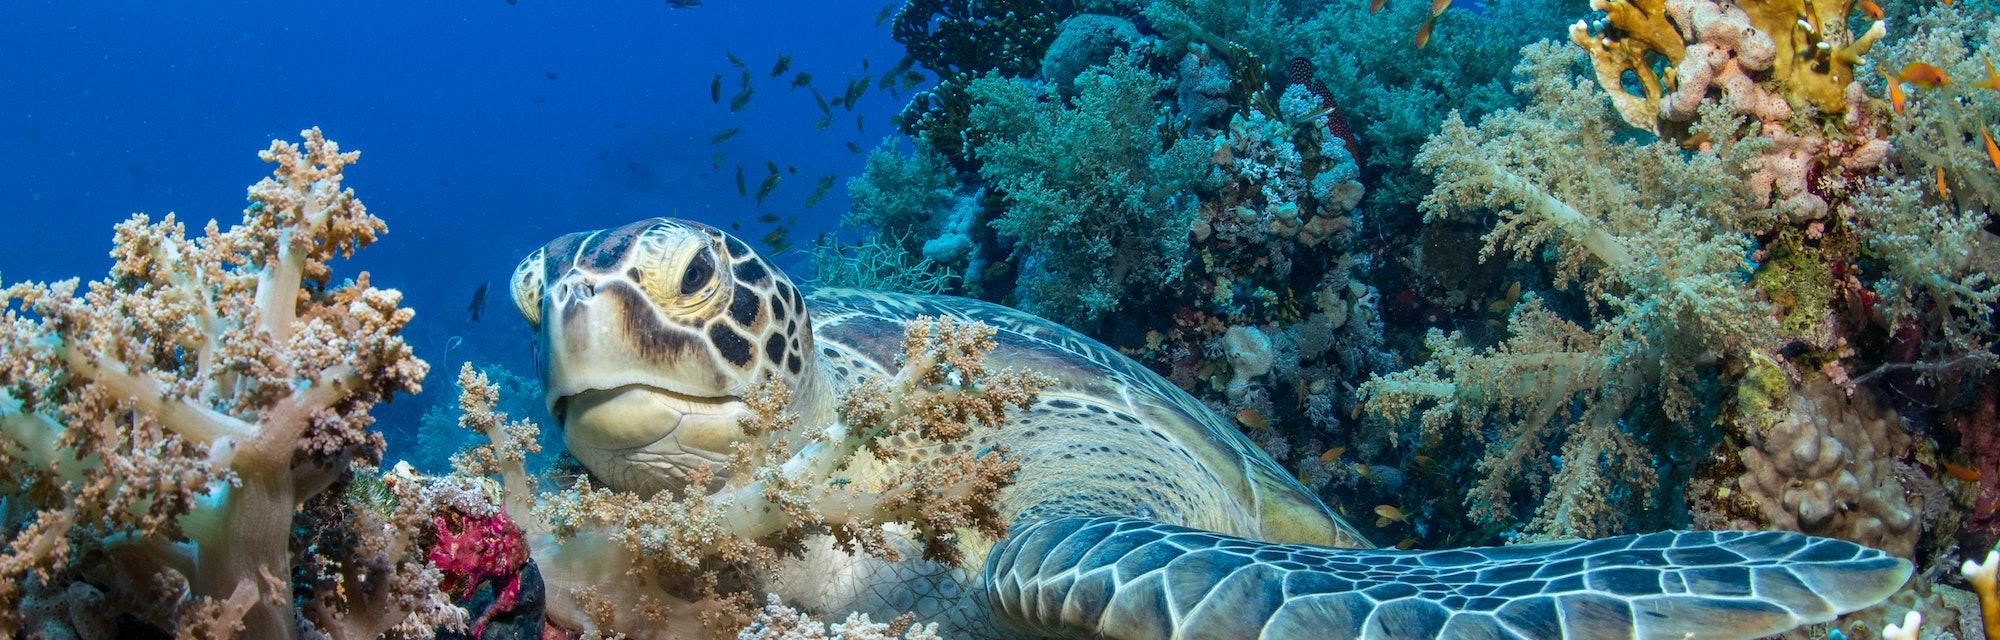 Sea turtle underwater scene. Underwater sea turtle. Sea turtle view. Underwater sea turtle portrait